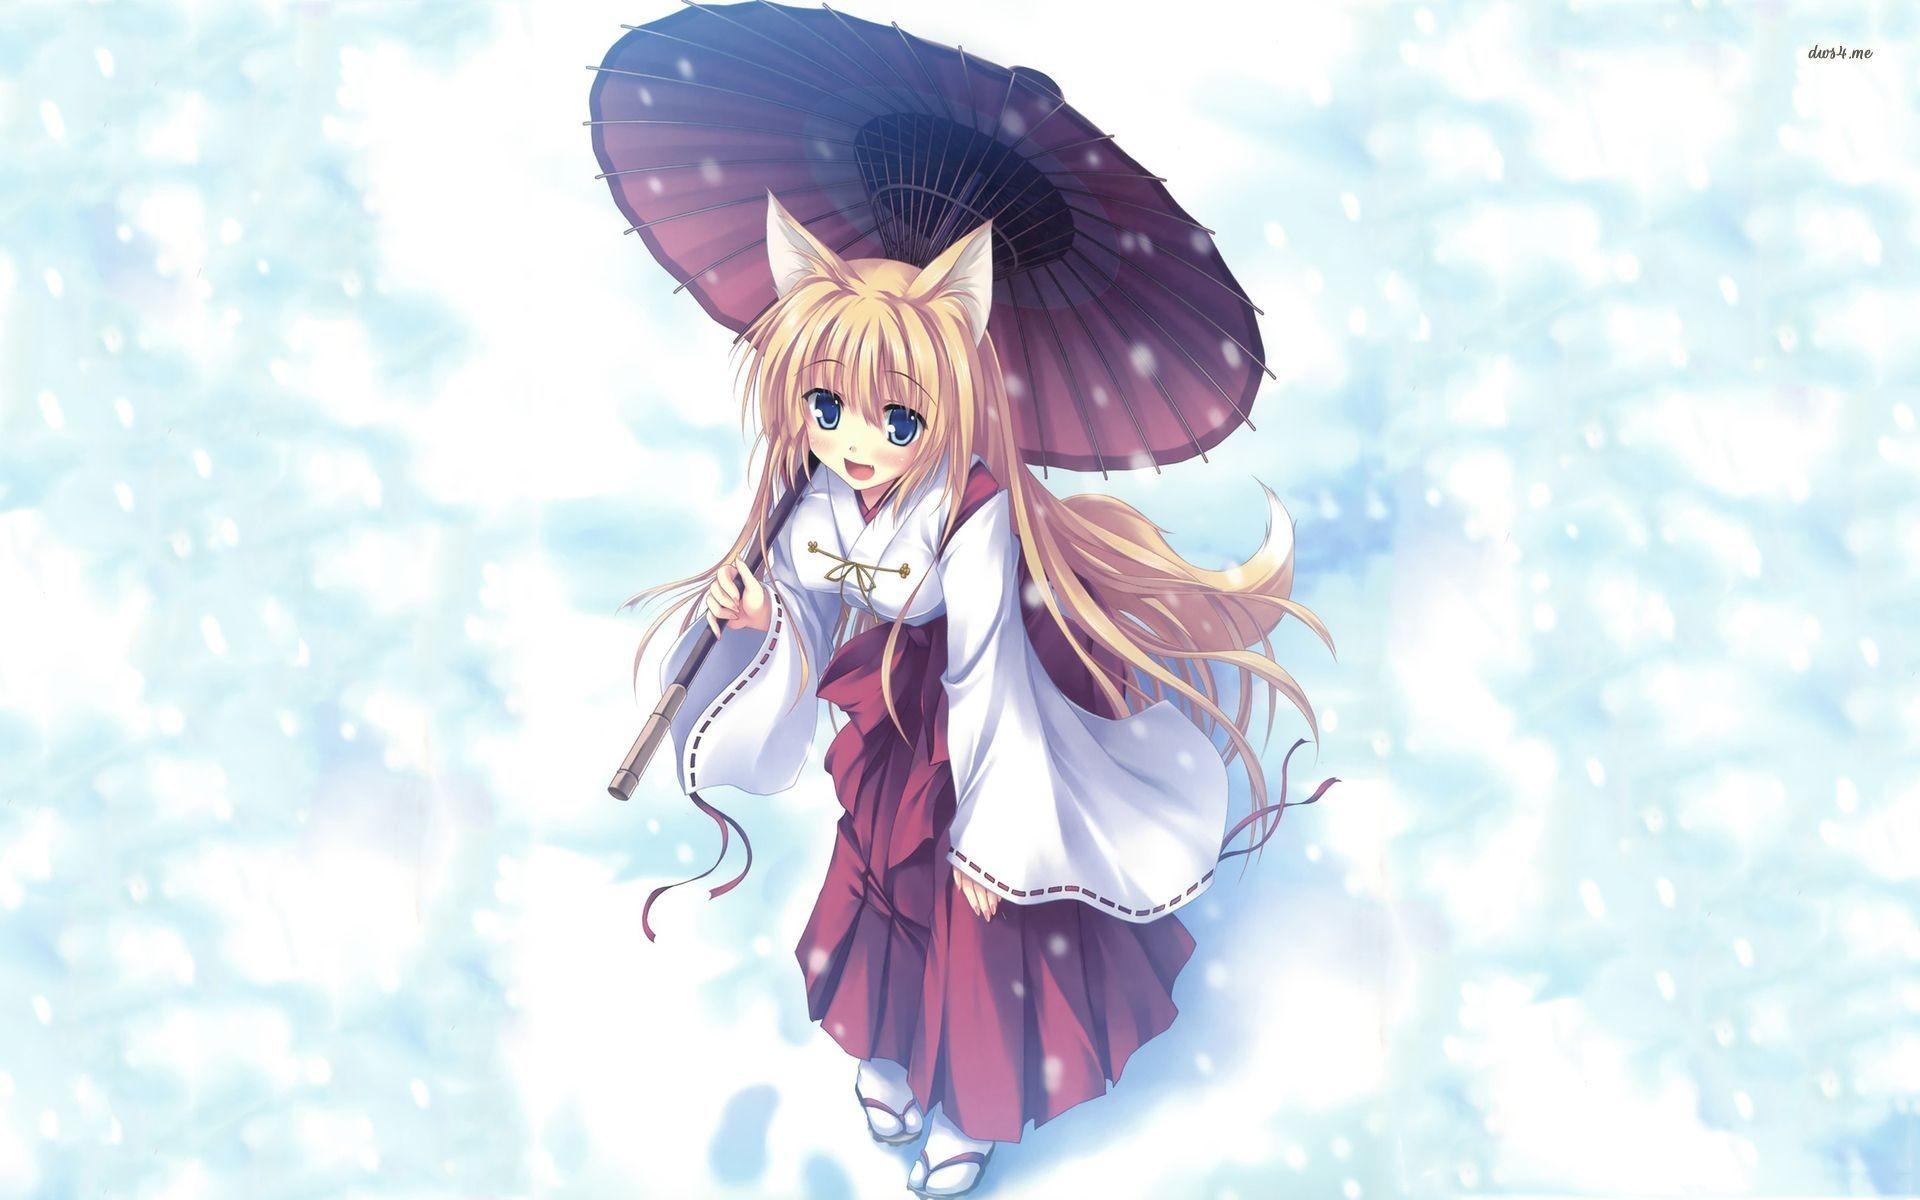 Cat girl with kimono wallpaper – Anime wallpapers – #40120